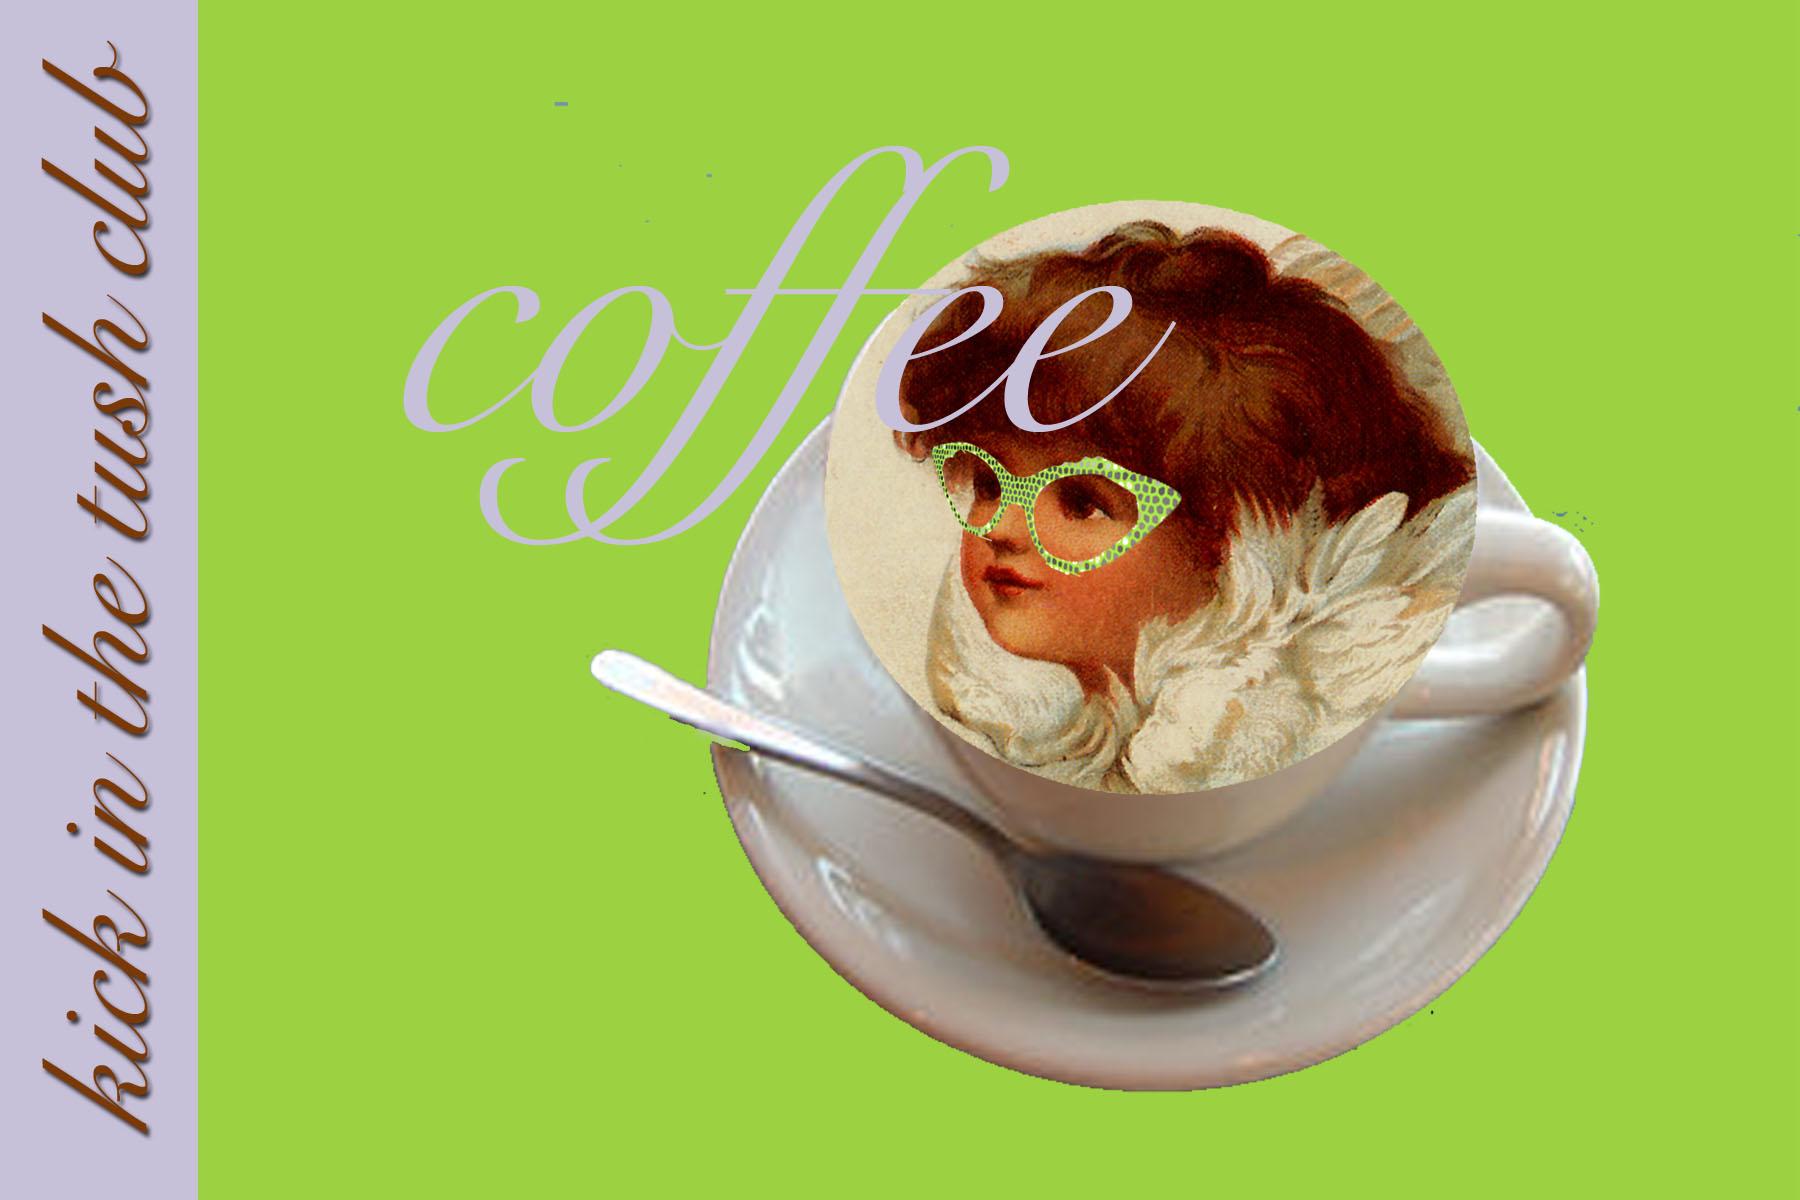 Quick Weight Loss : Caffeine